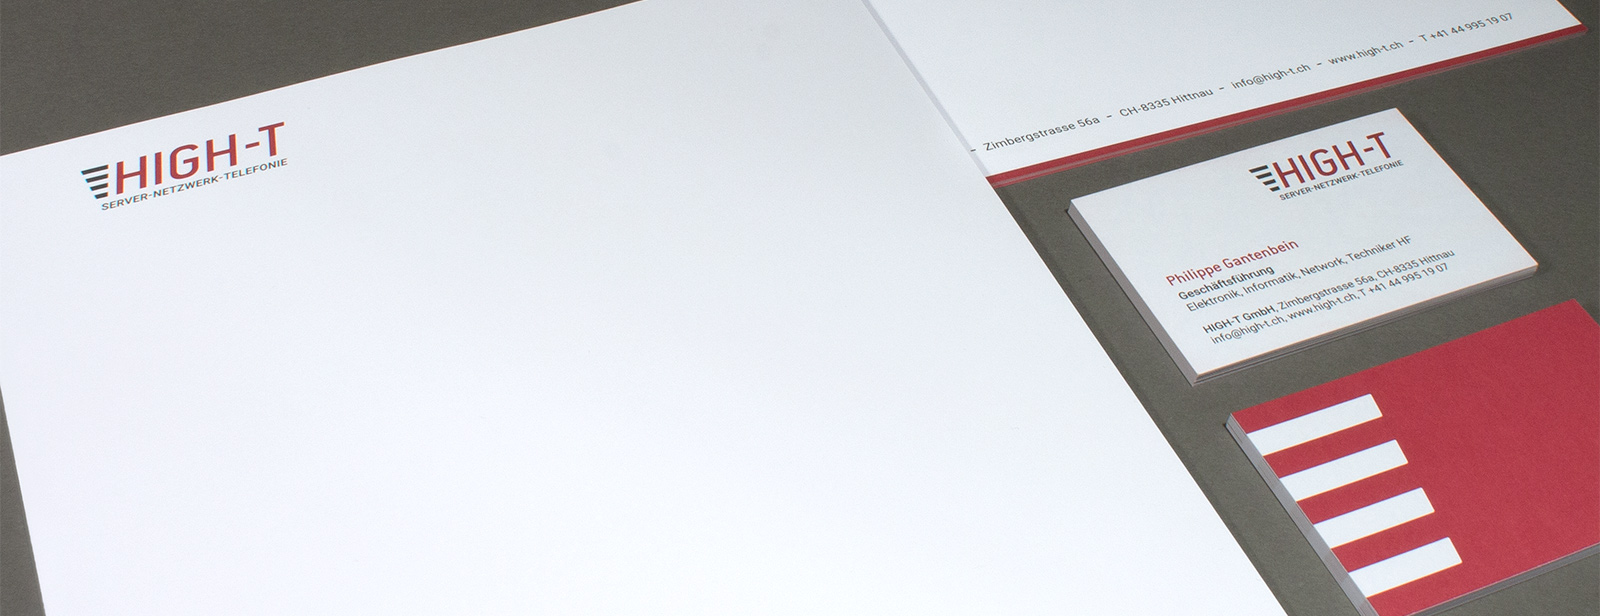 content-referenzen-details-high-t-corporate-design-desktop